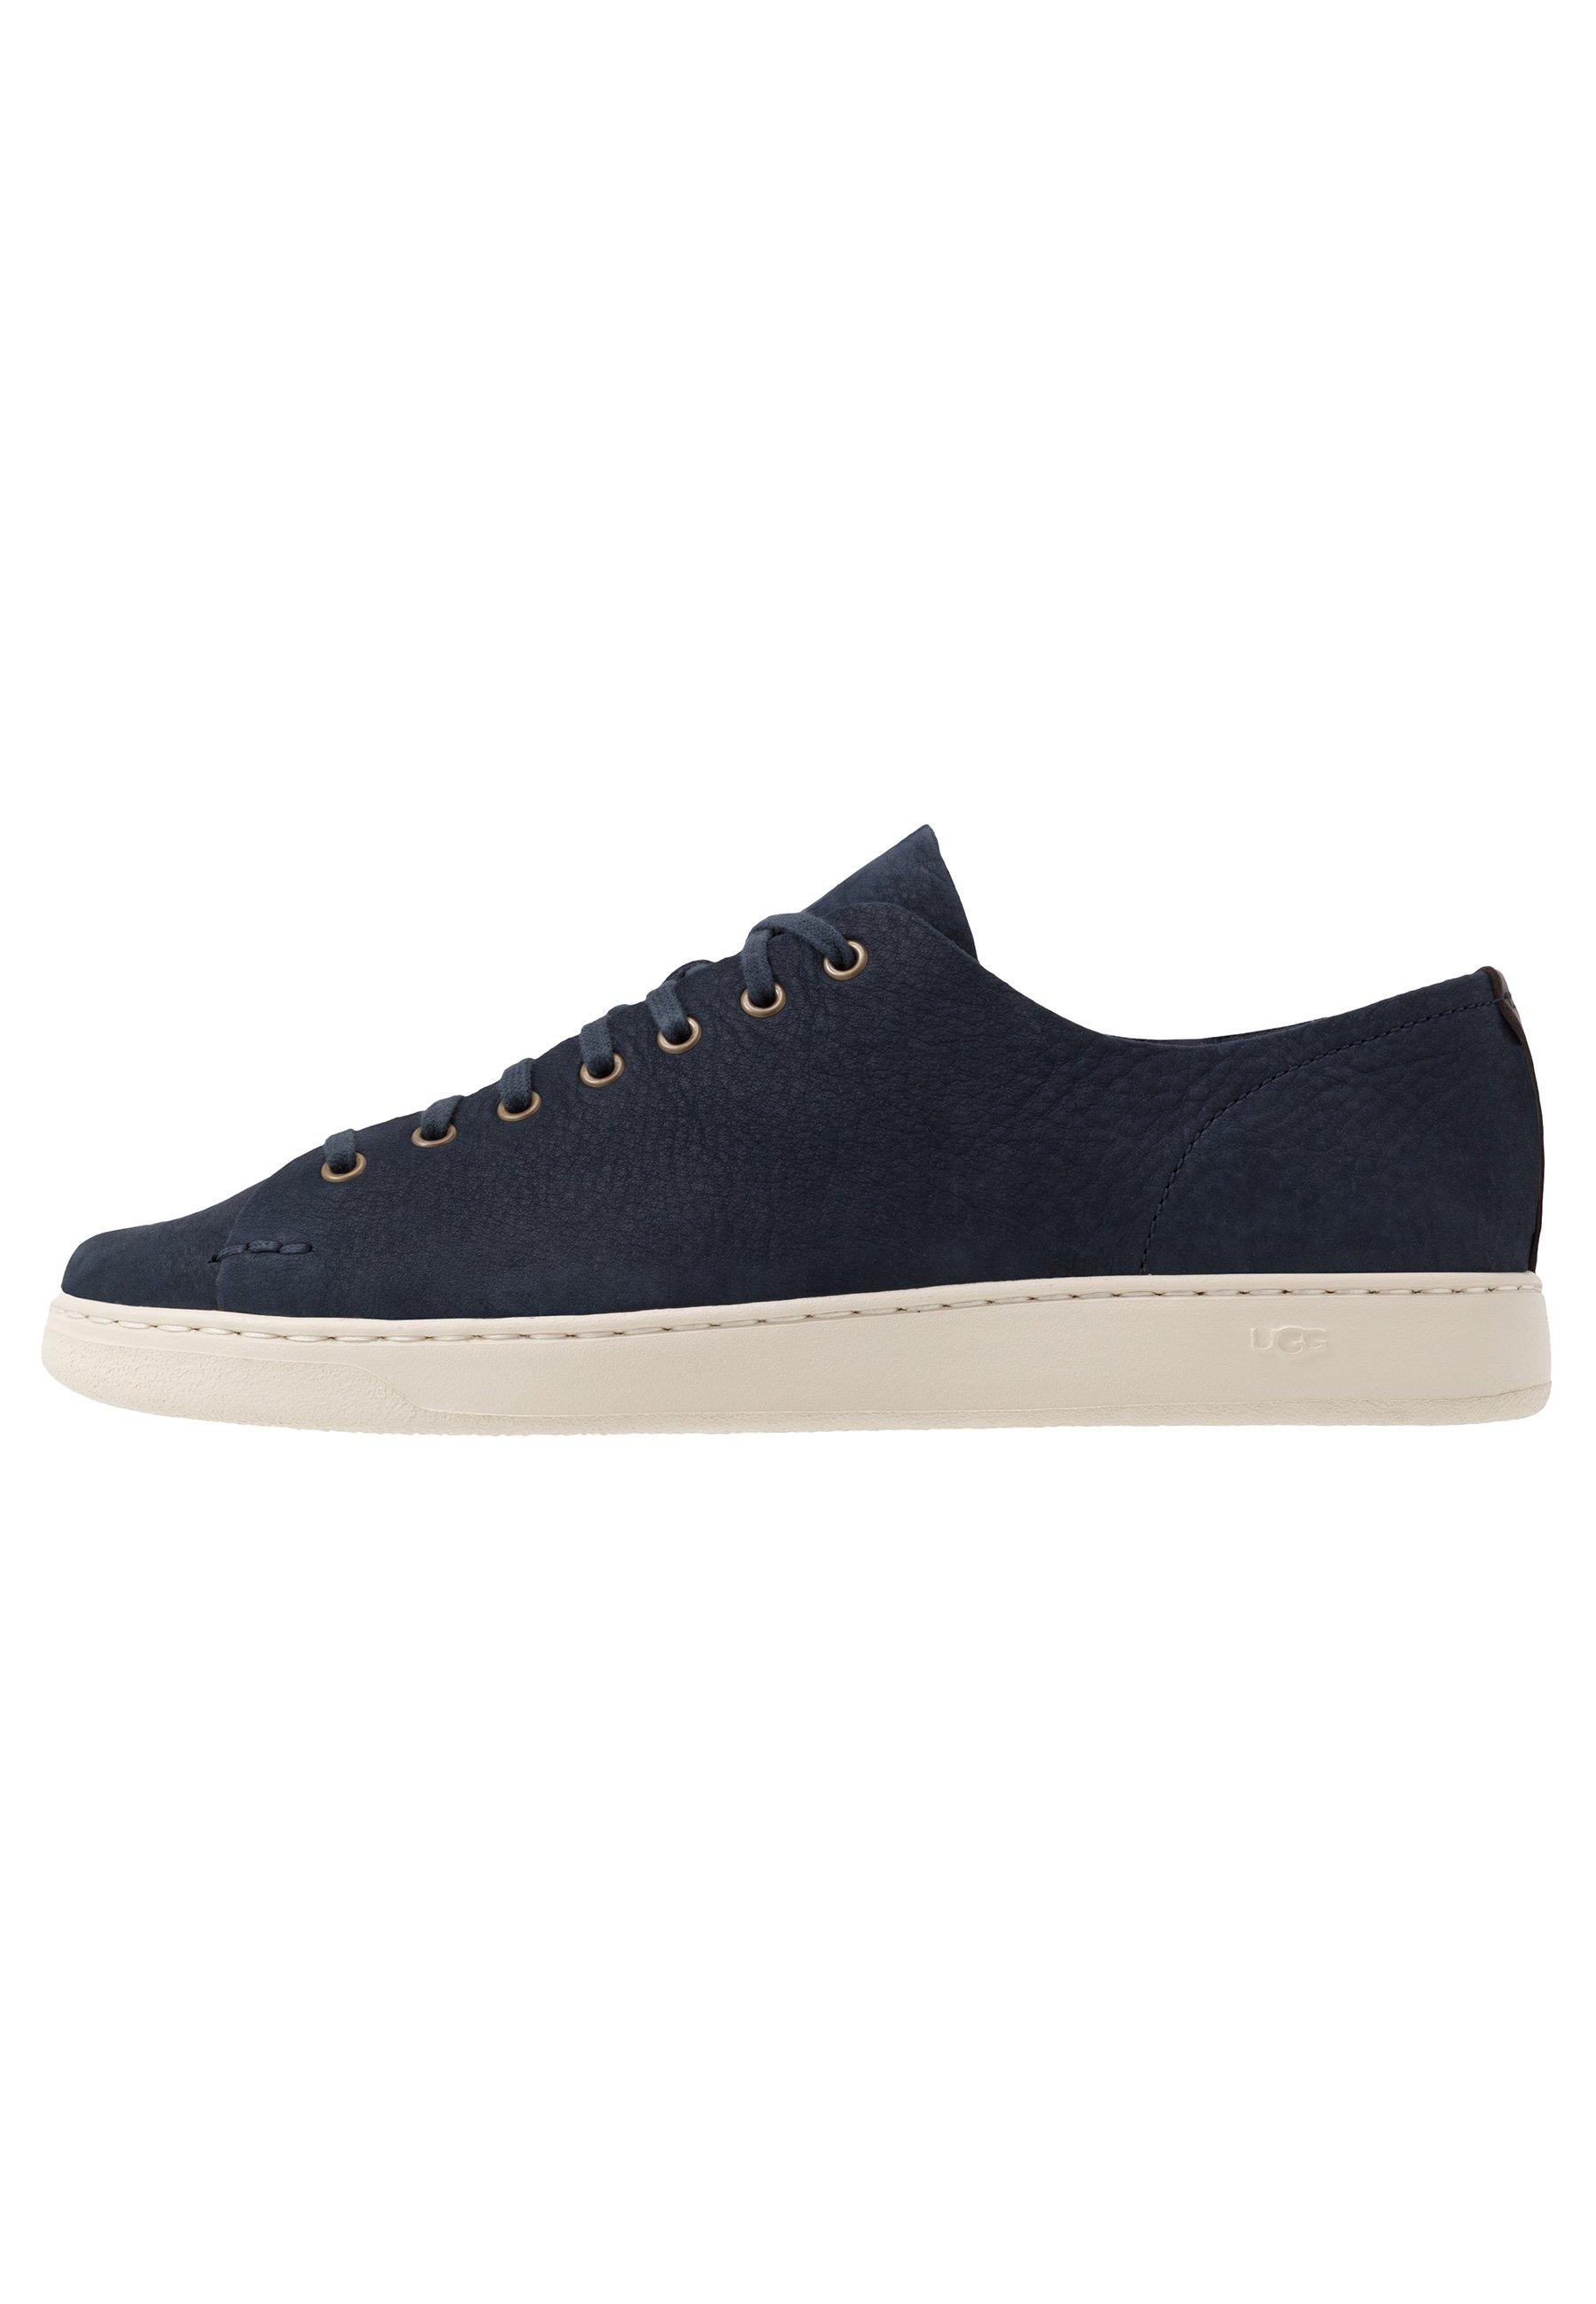 PISMO Sneakers dark sapphire